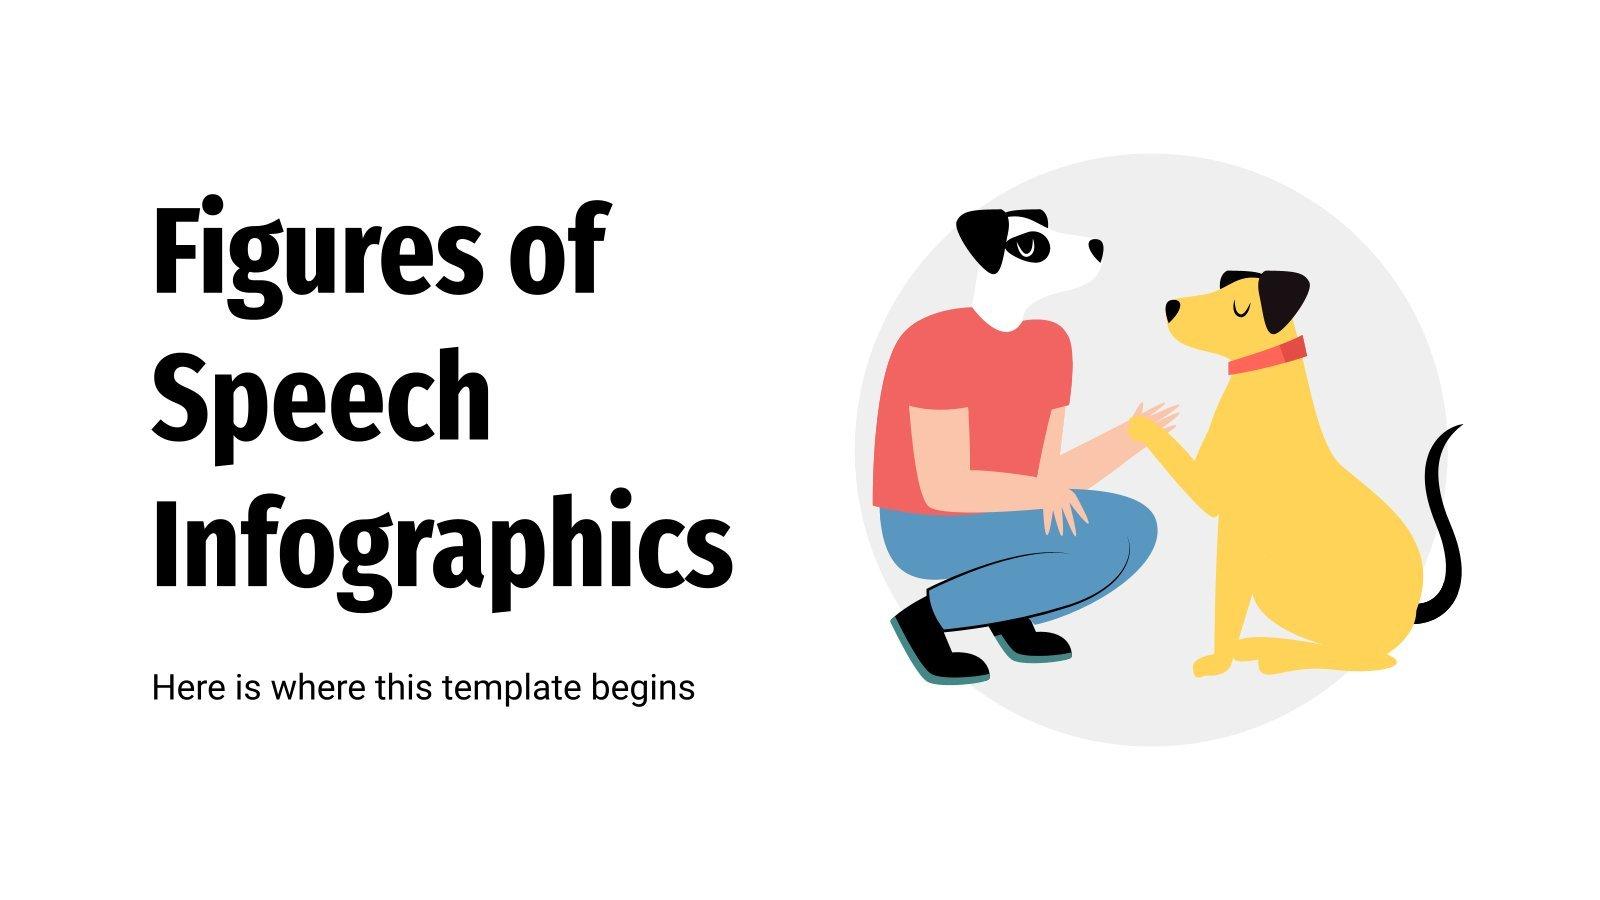 Figure of Speech Infographics presentation template